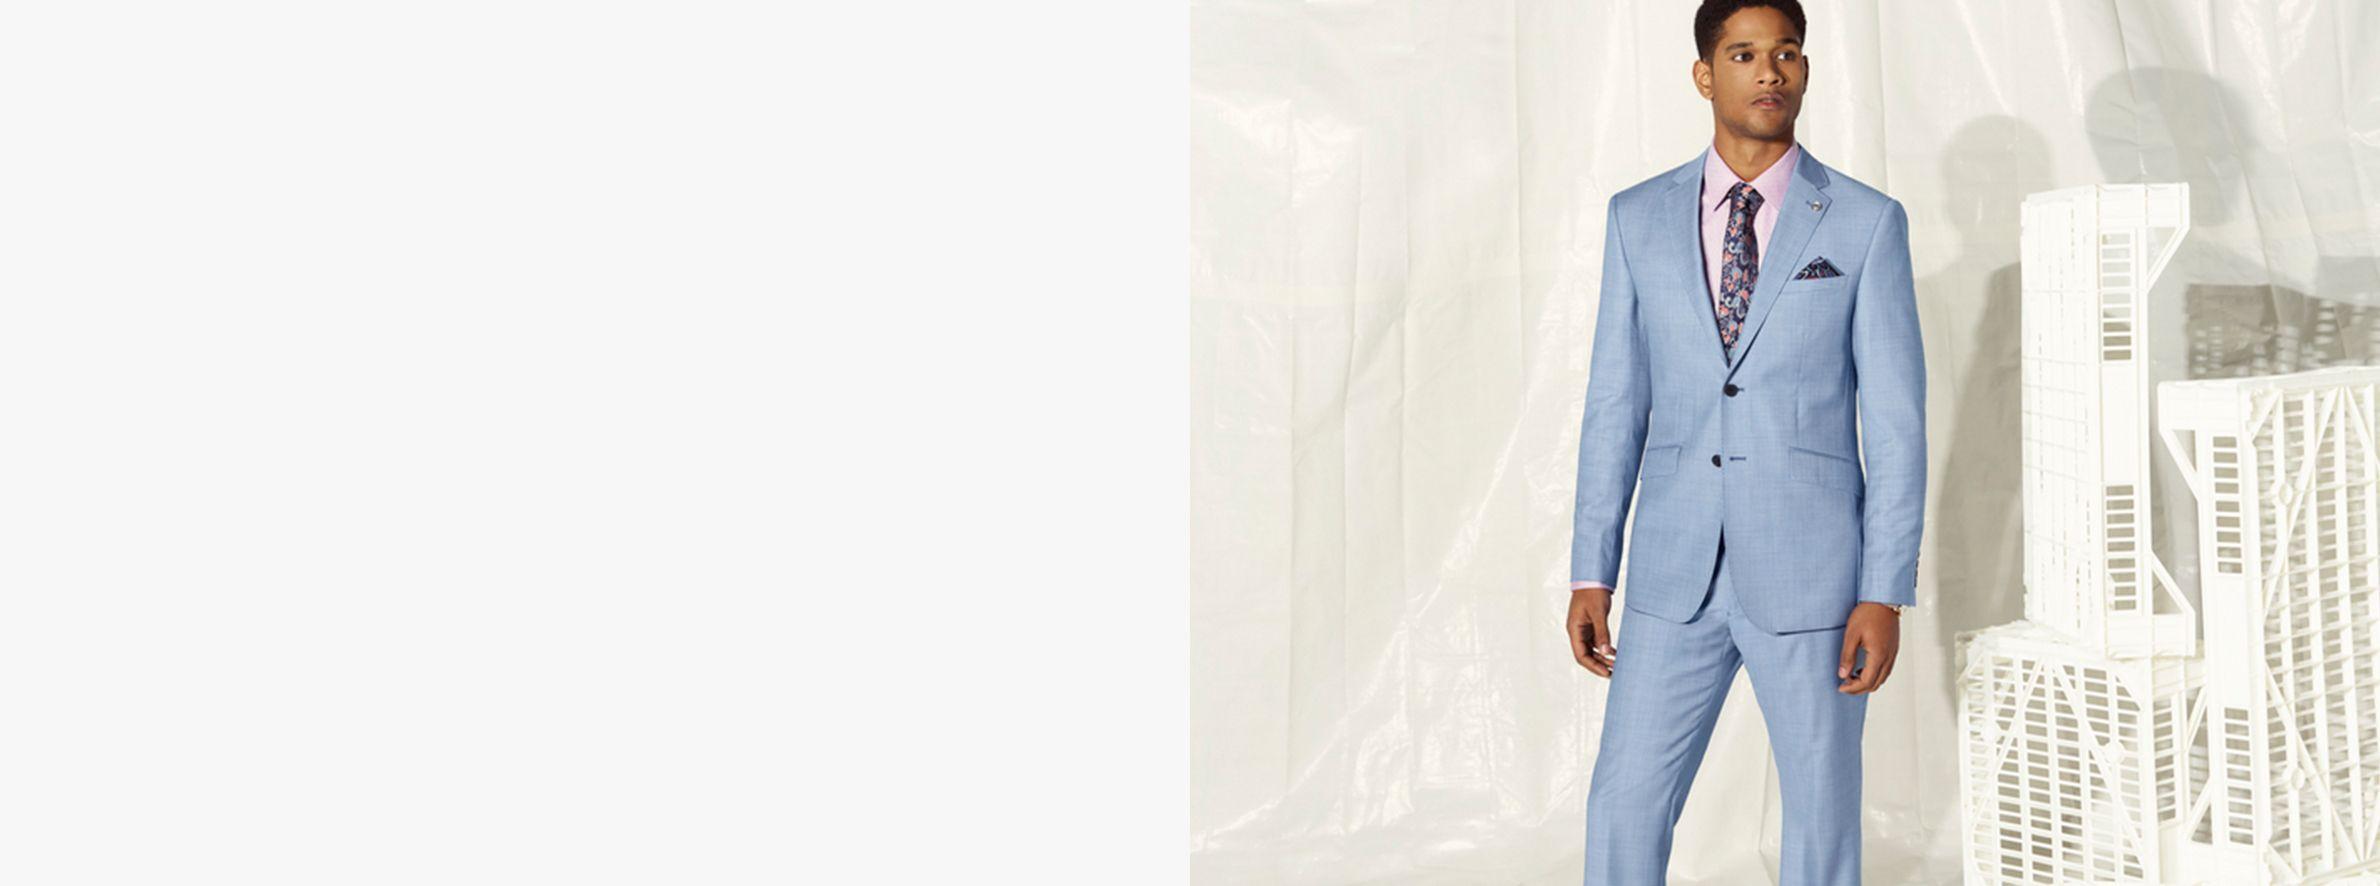 81bd10a20f4ec Men's Suits | Regular, Tailored, Slim Fit | John Lewis & Partners